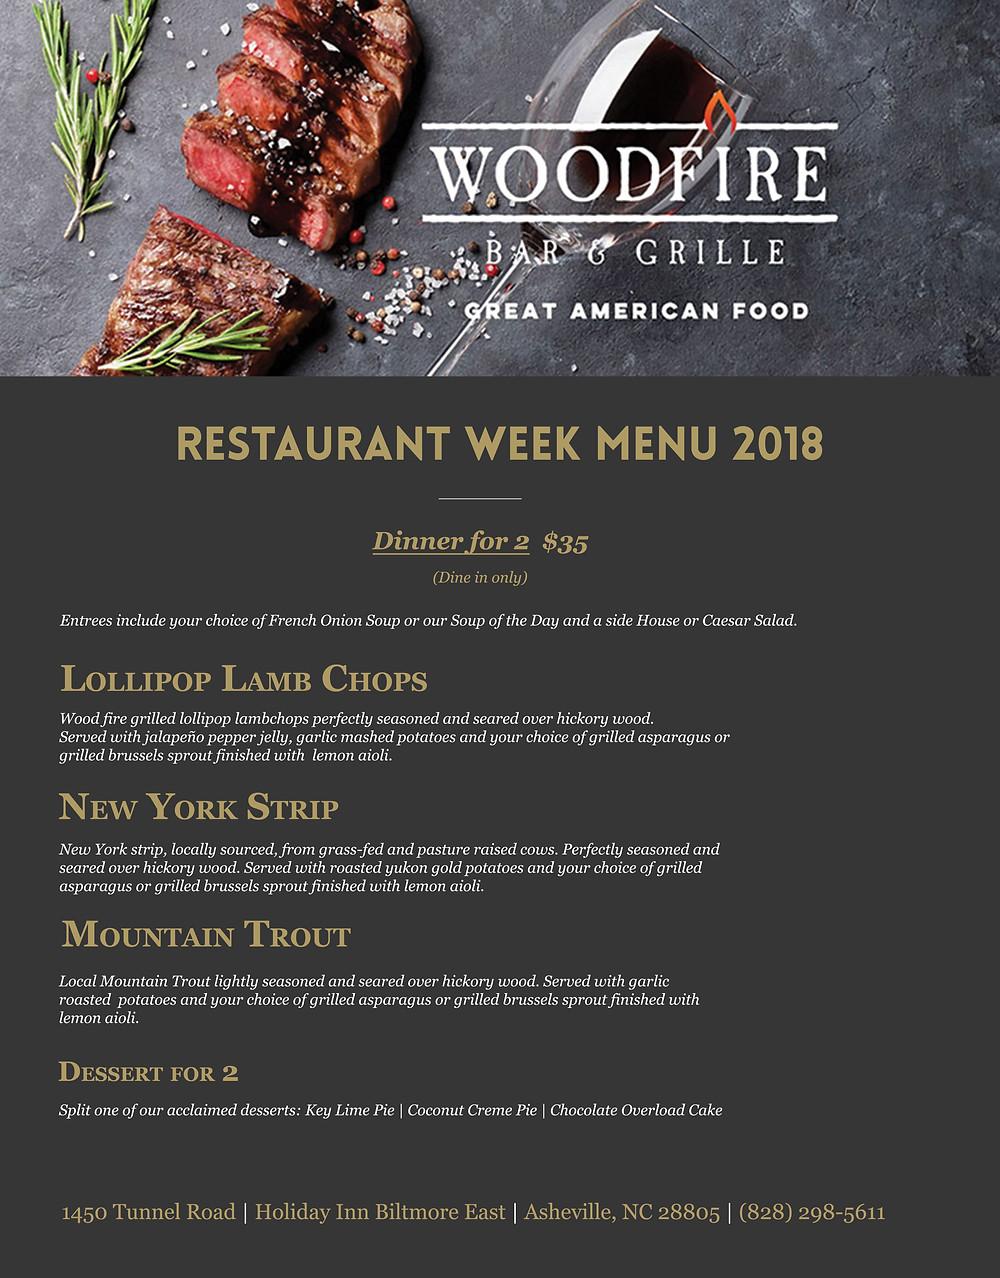 Woodfire Bar & Grille Menu for Restaurant Week 2018